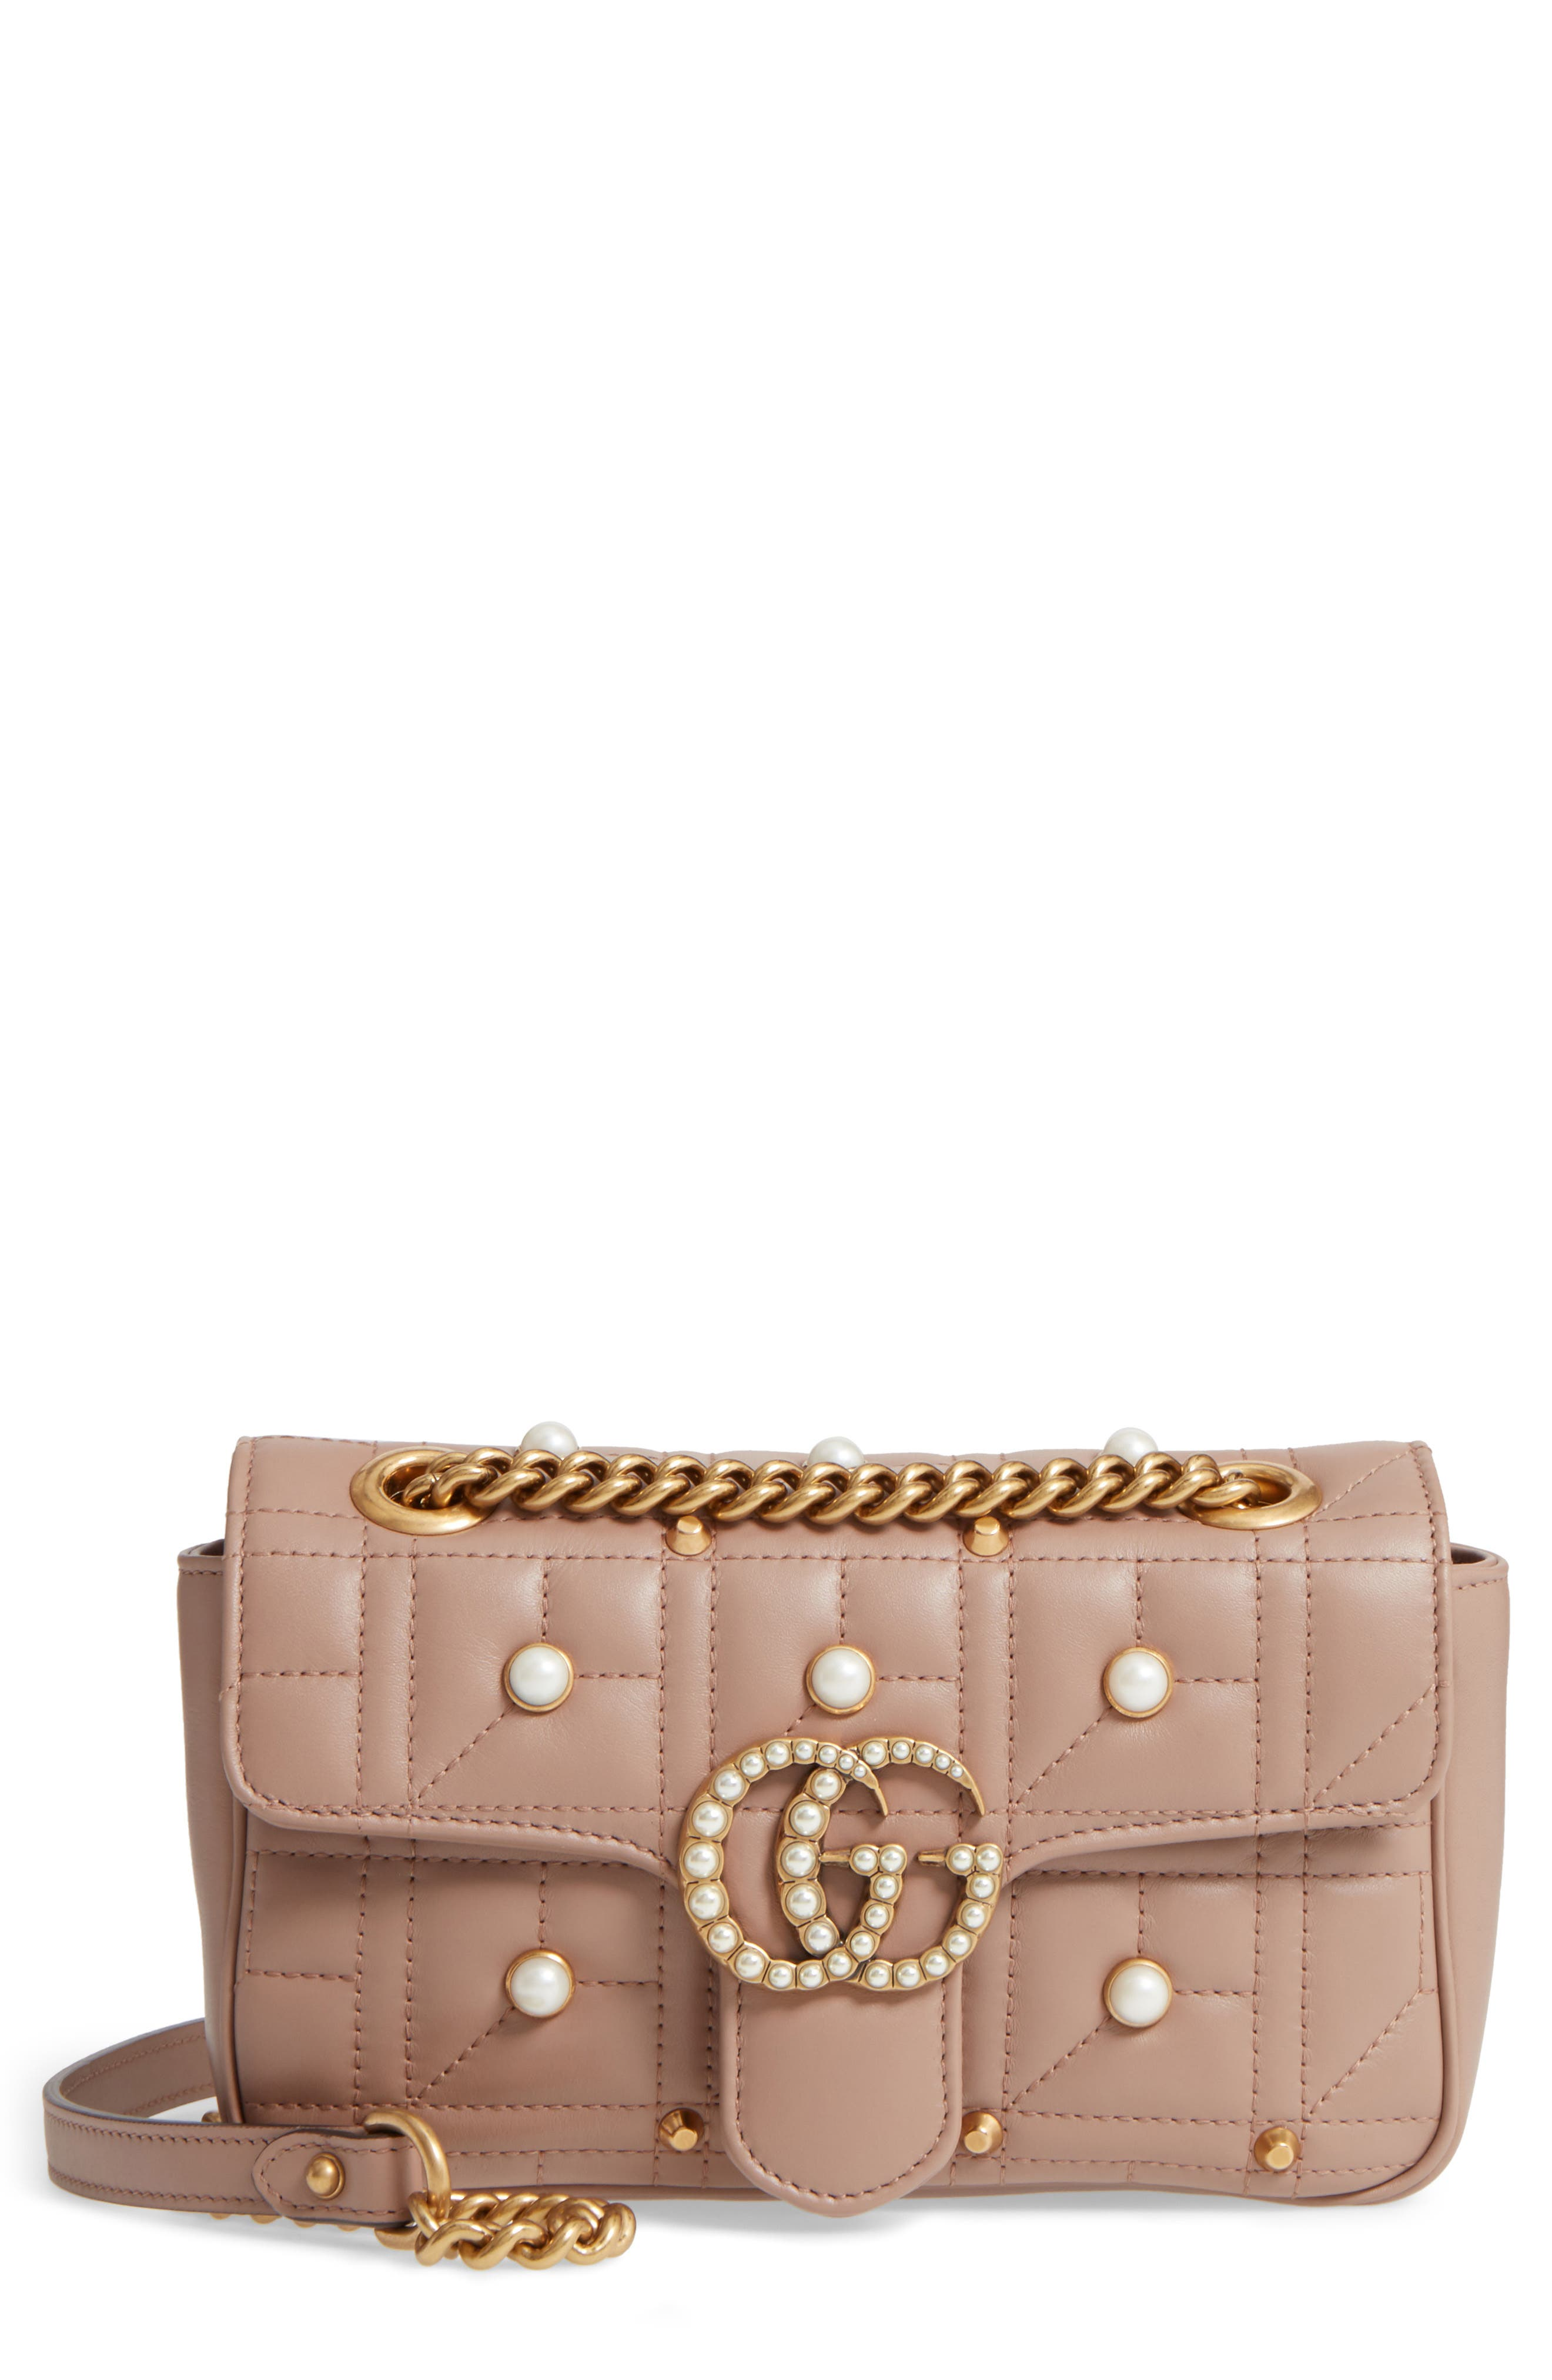 Main Image - Gucci Mini GG Marmont 2.0 Imitation Pearl Logo Matelassé Leather Shoulder Bag